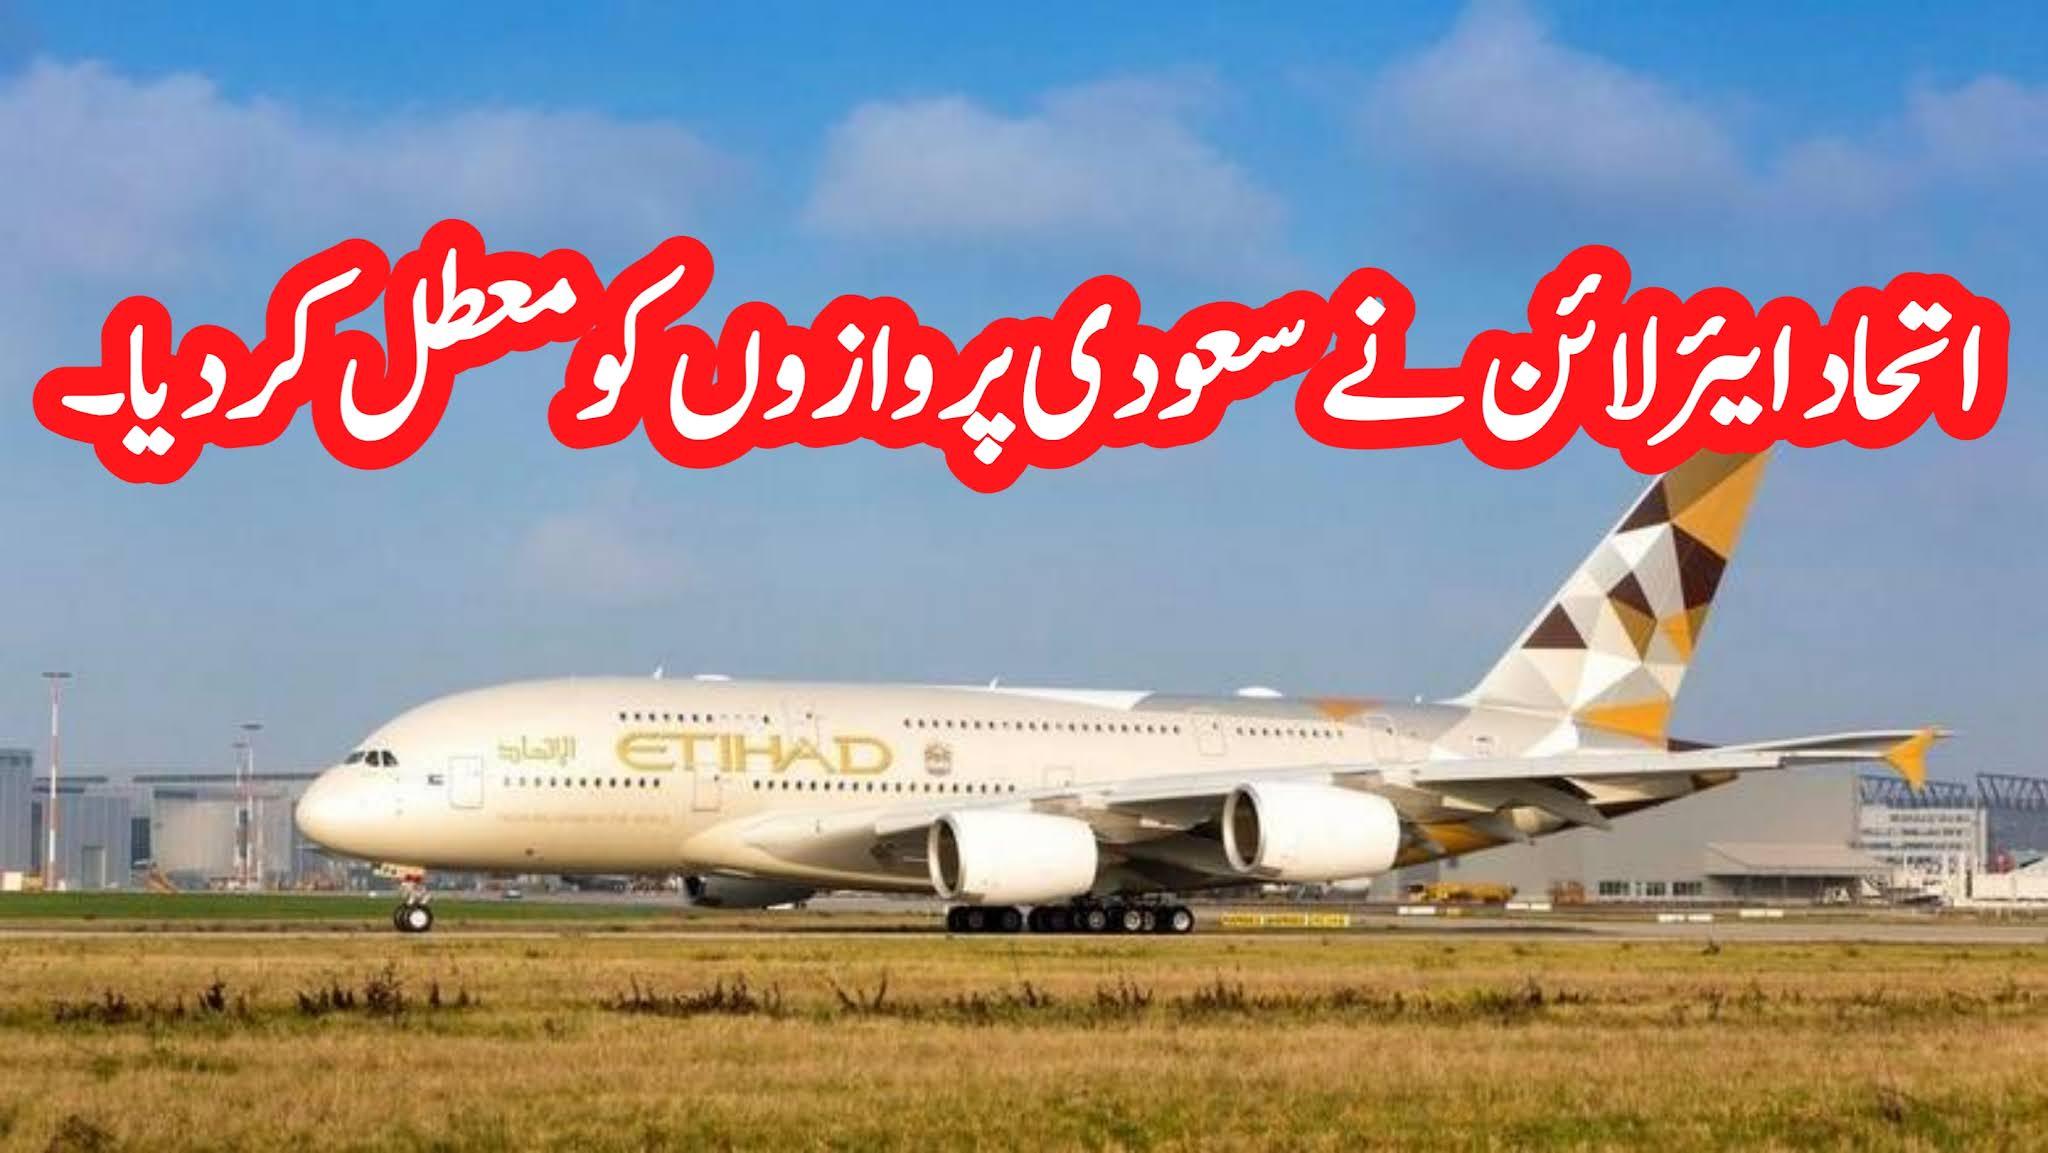 The Etihad suspended Saudi flights until further notice   اتحاد نے سعودی پروازوں کو اگلے نوٹس تک معطل کردیا۔